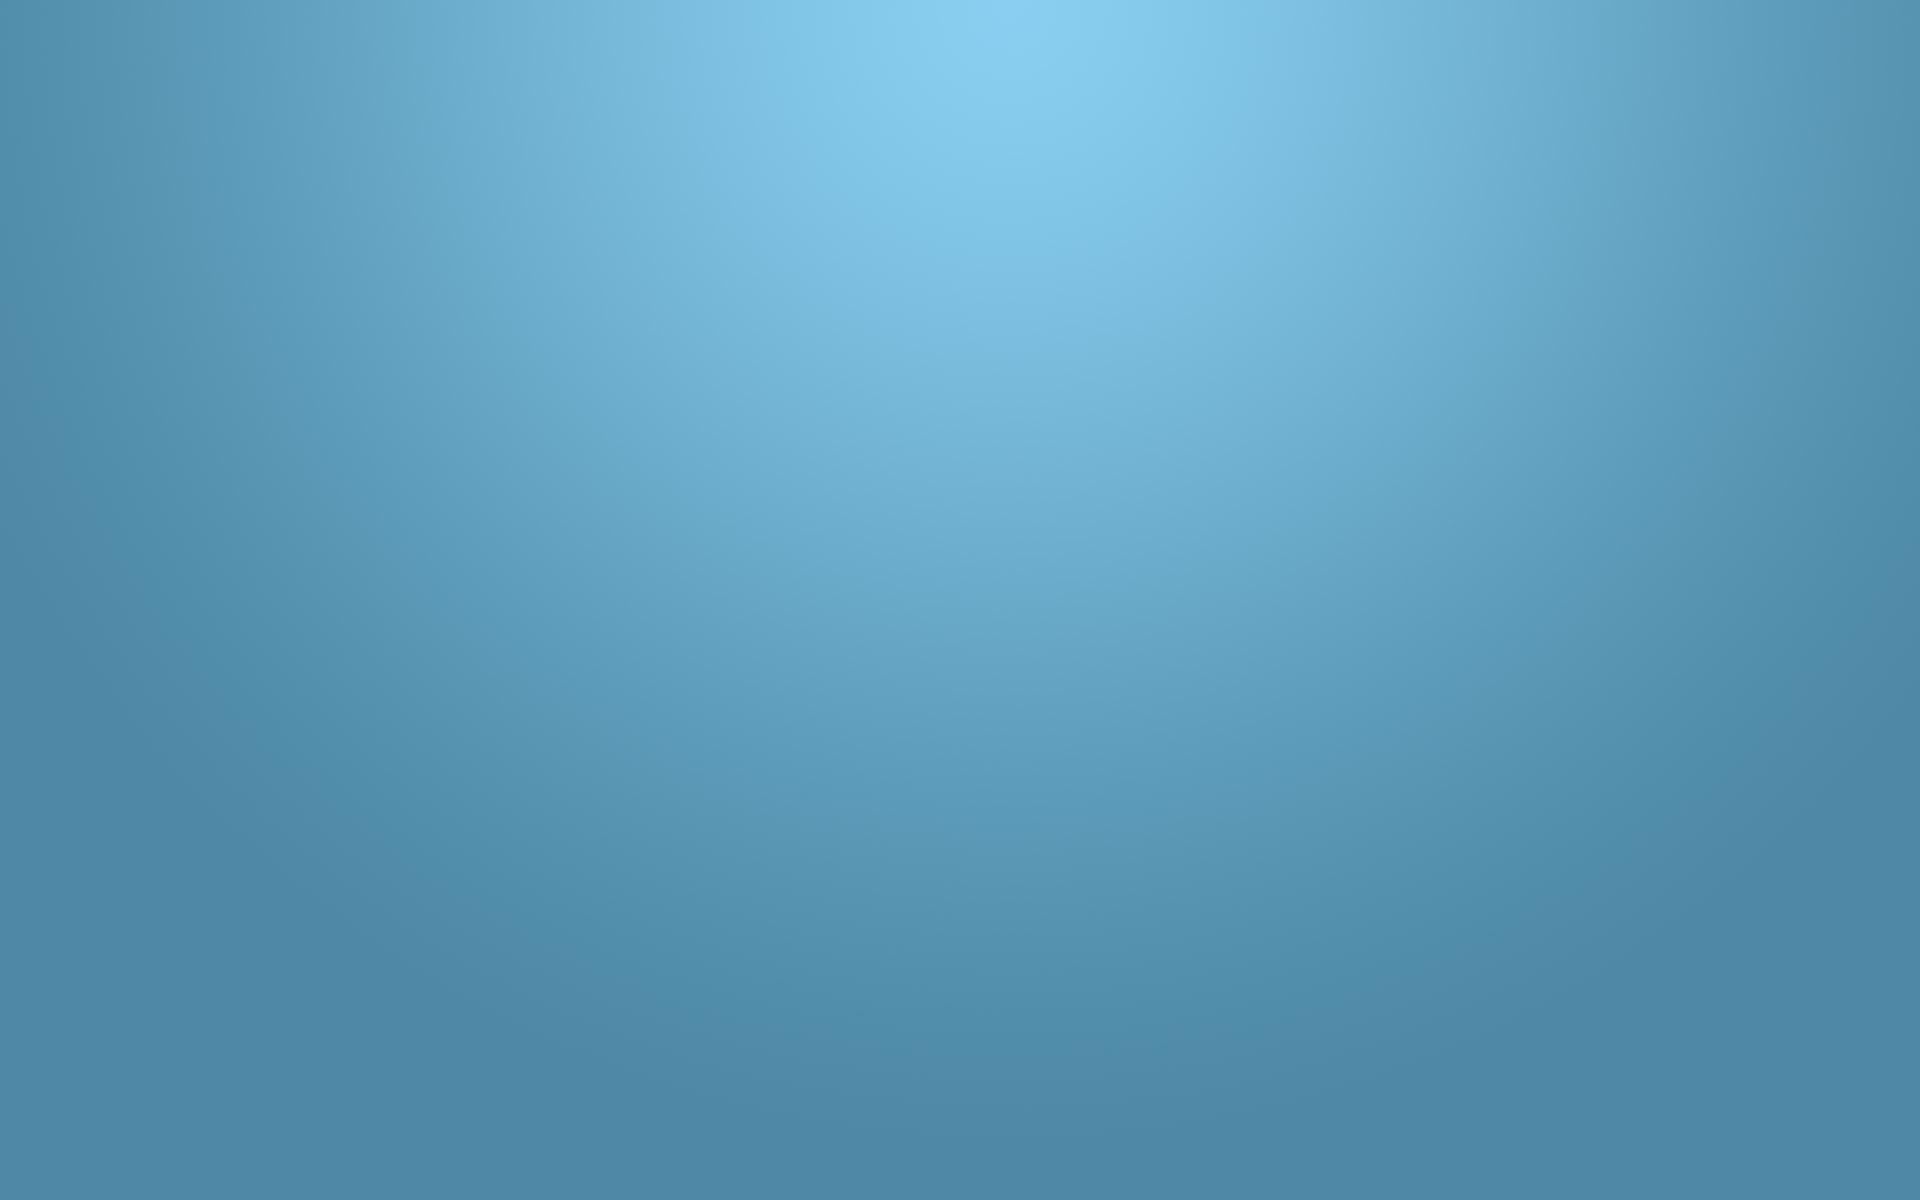 1920x1200 Baby Blue Windows 7 Desktop Wallpaper Baby 1920x1200